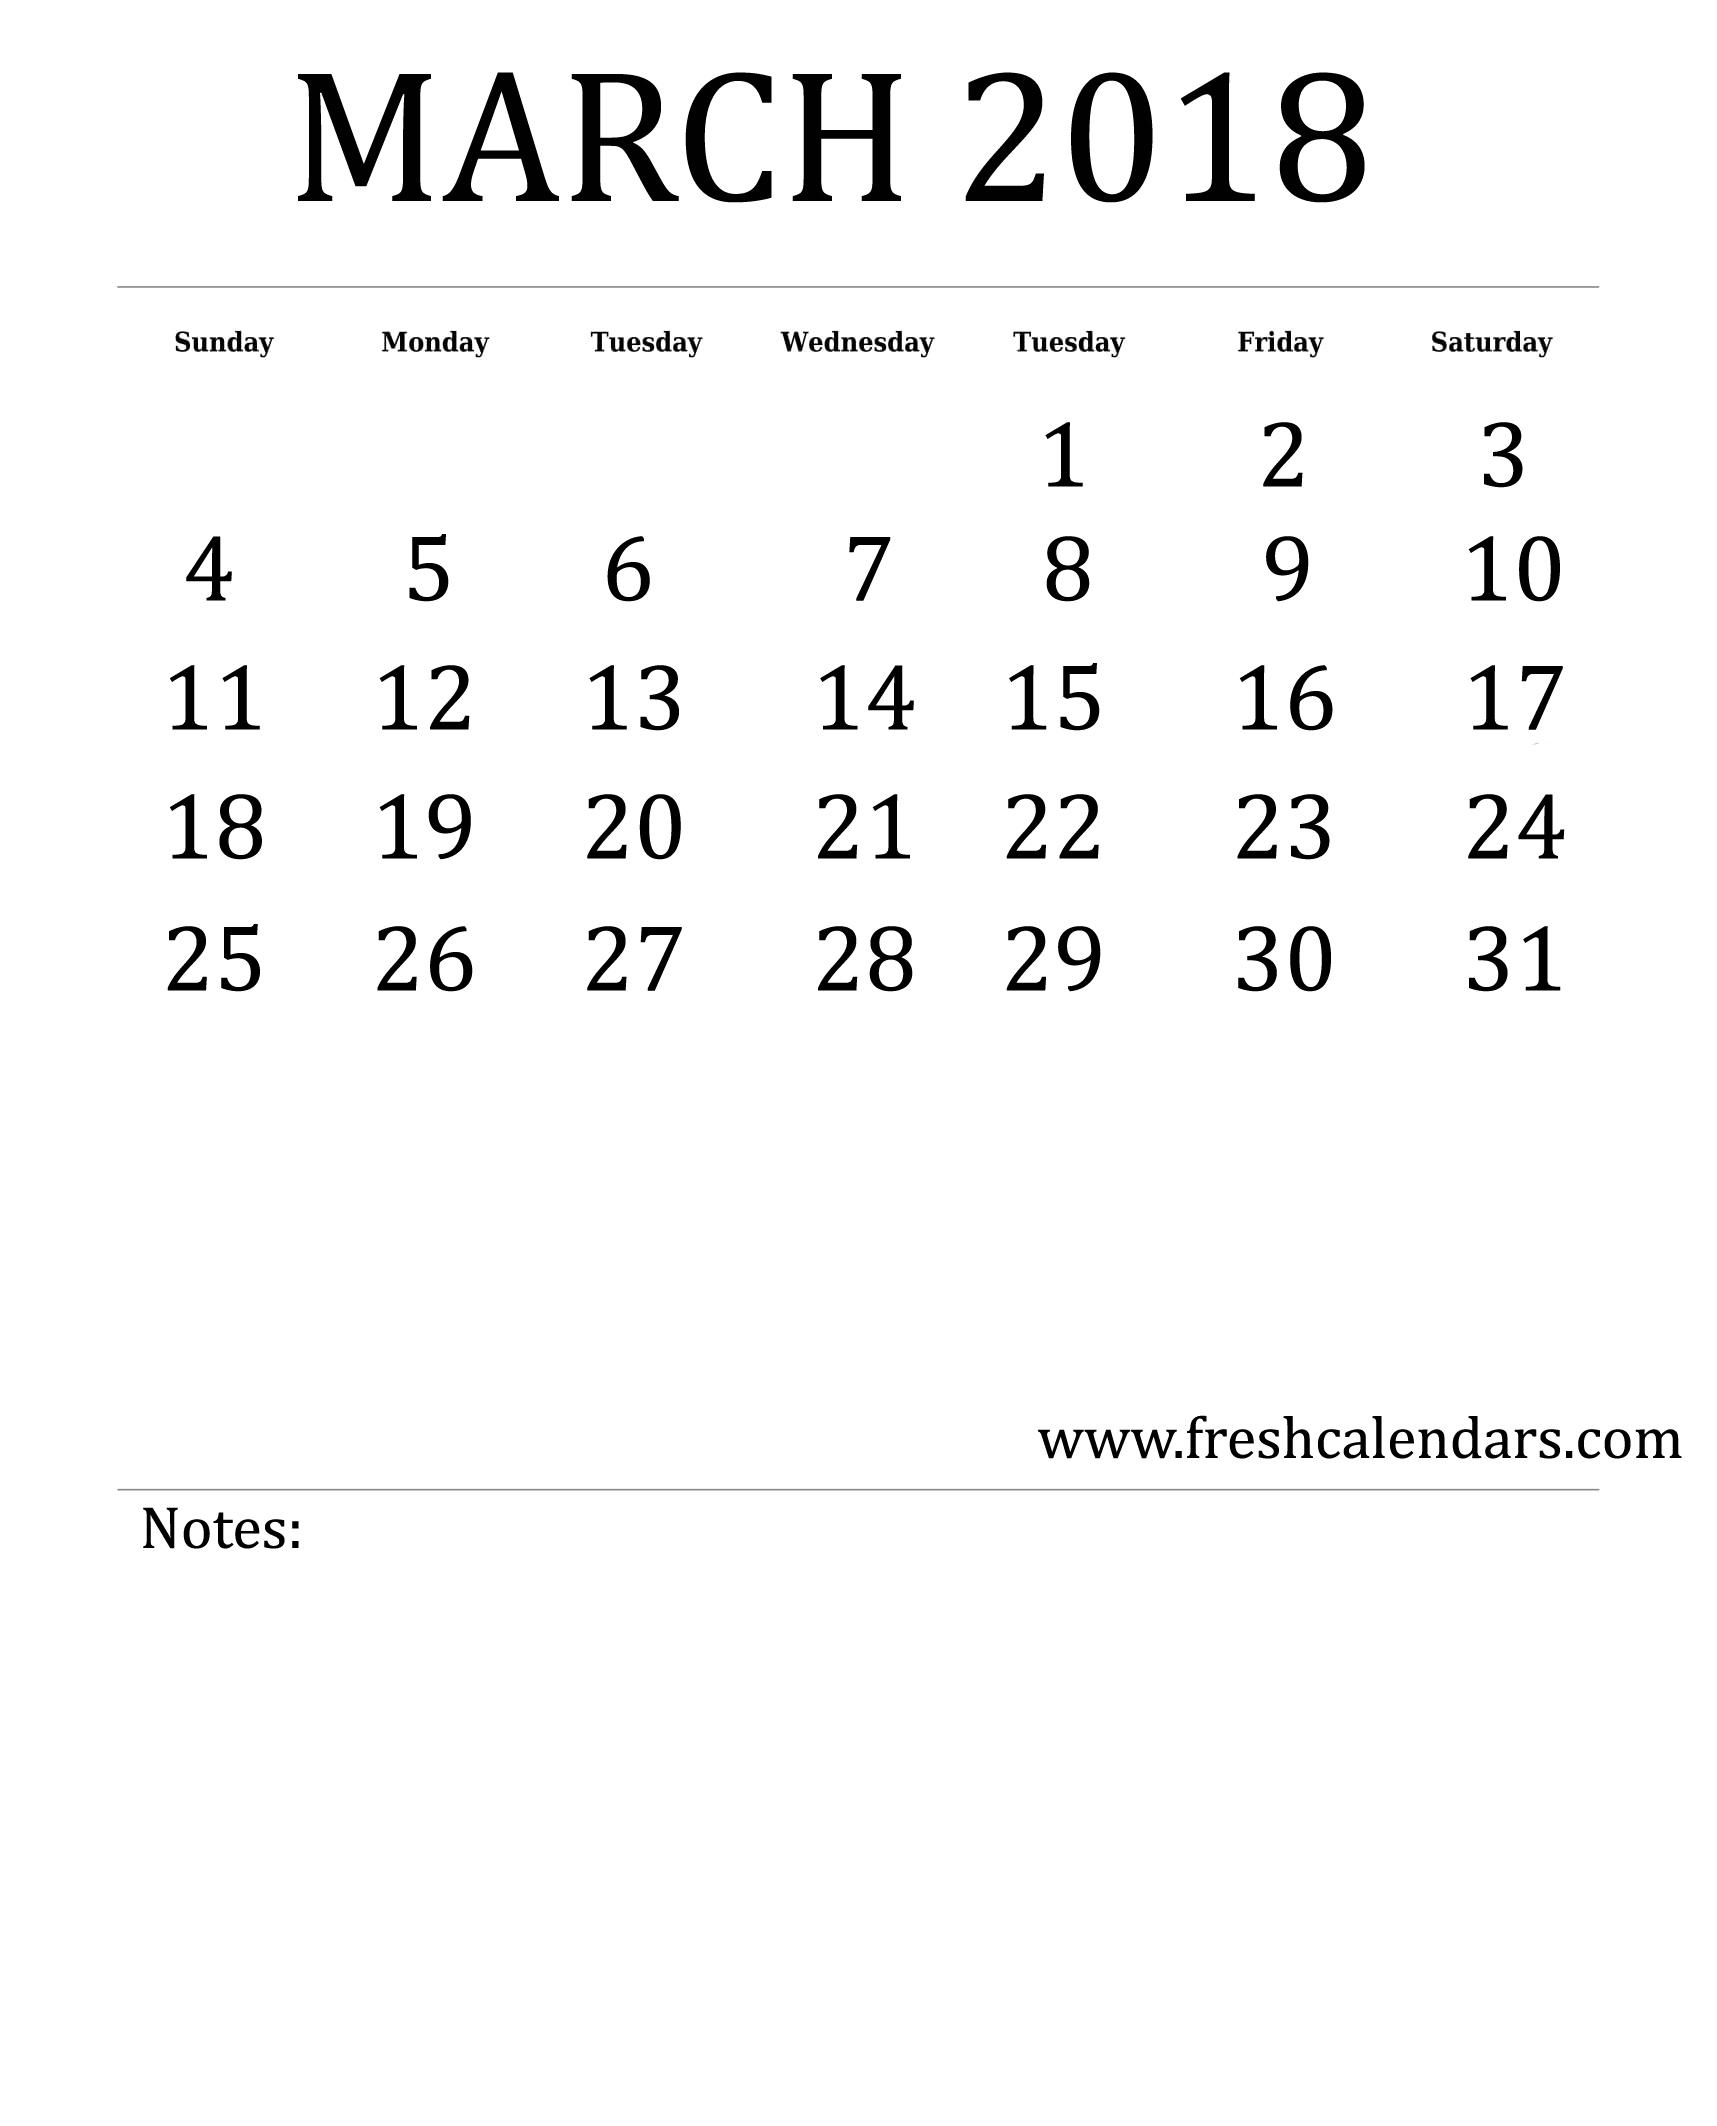 25 Printable March 2018 Calendar Templates Online3abry